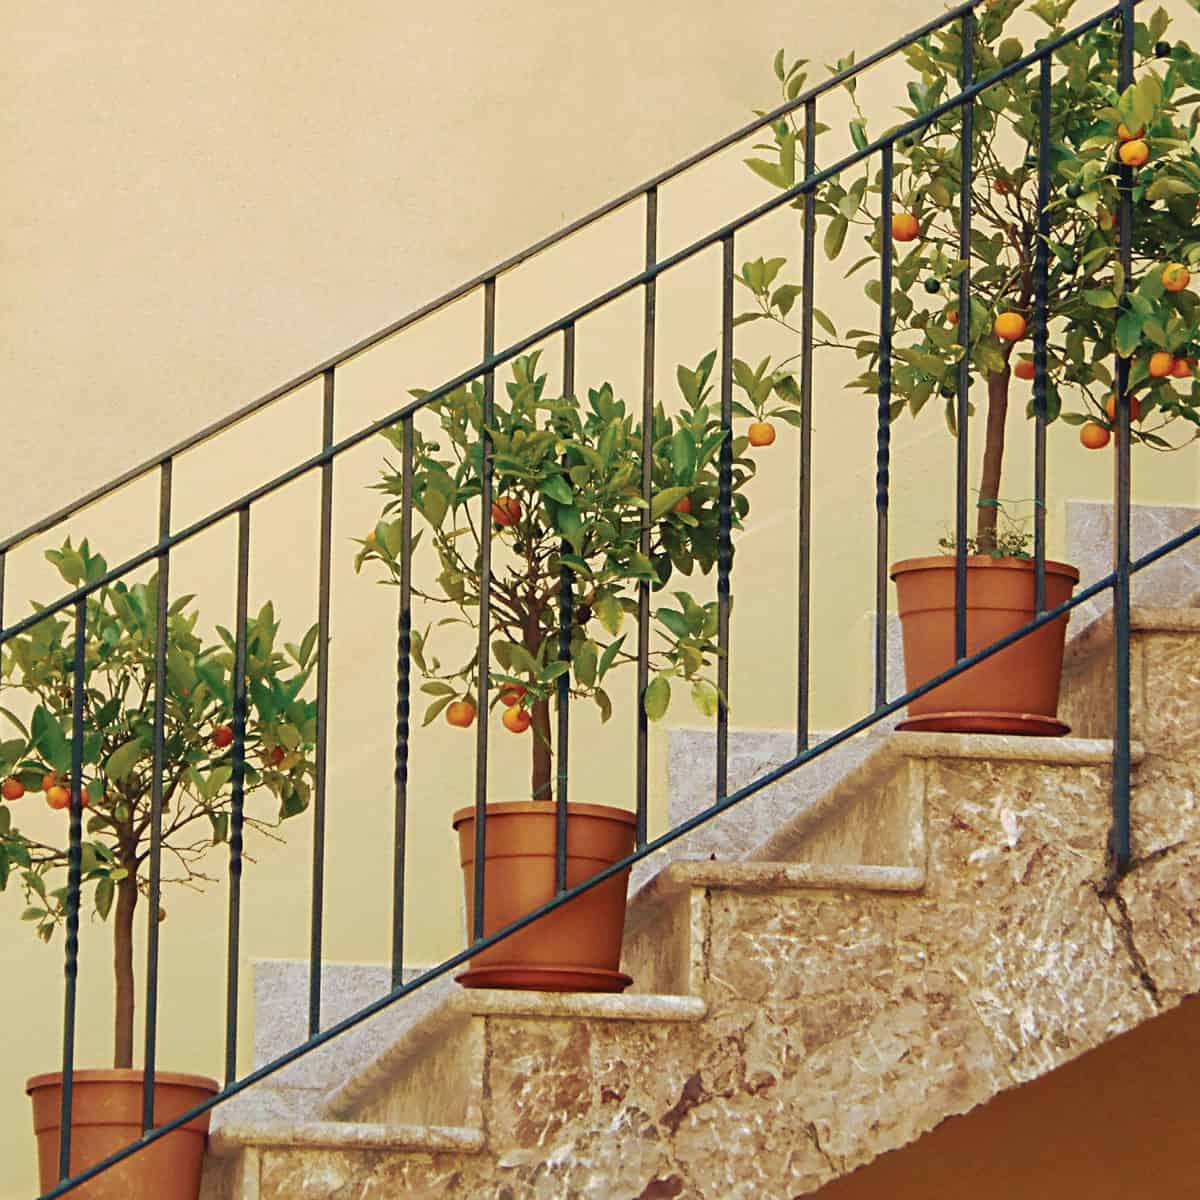 Dwarf orange tree display on a balcony staircase